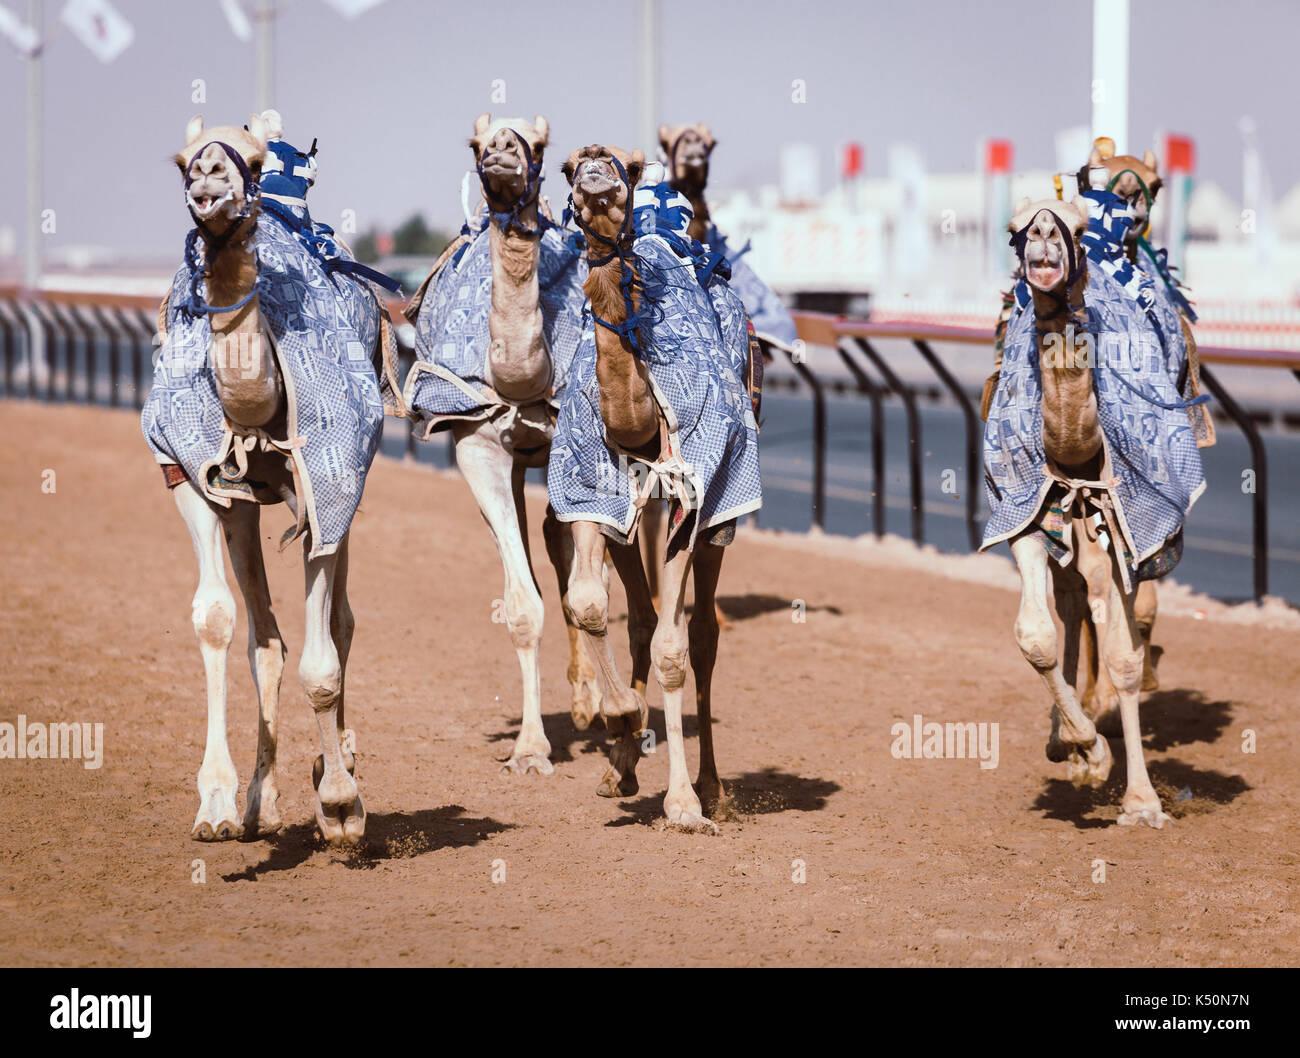 Camels with robot jokeys at racing practice near Dubai, UAE - Stock Image